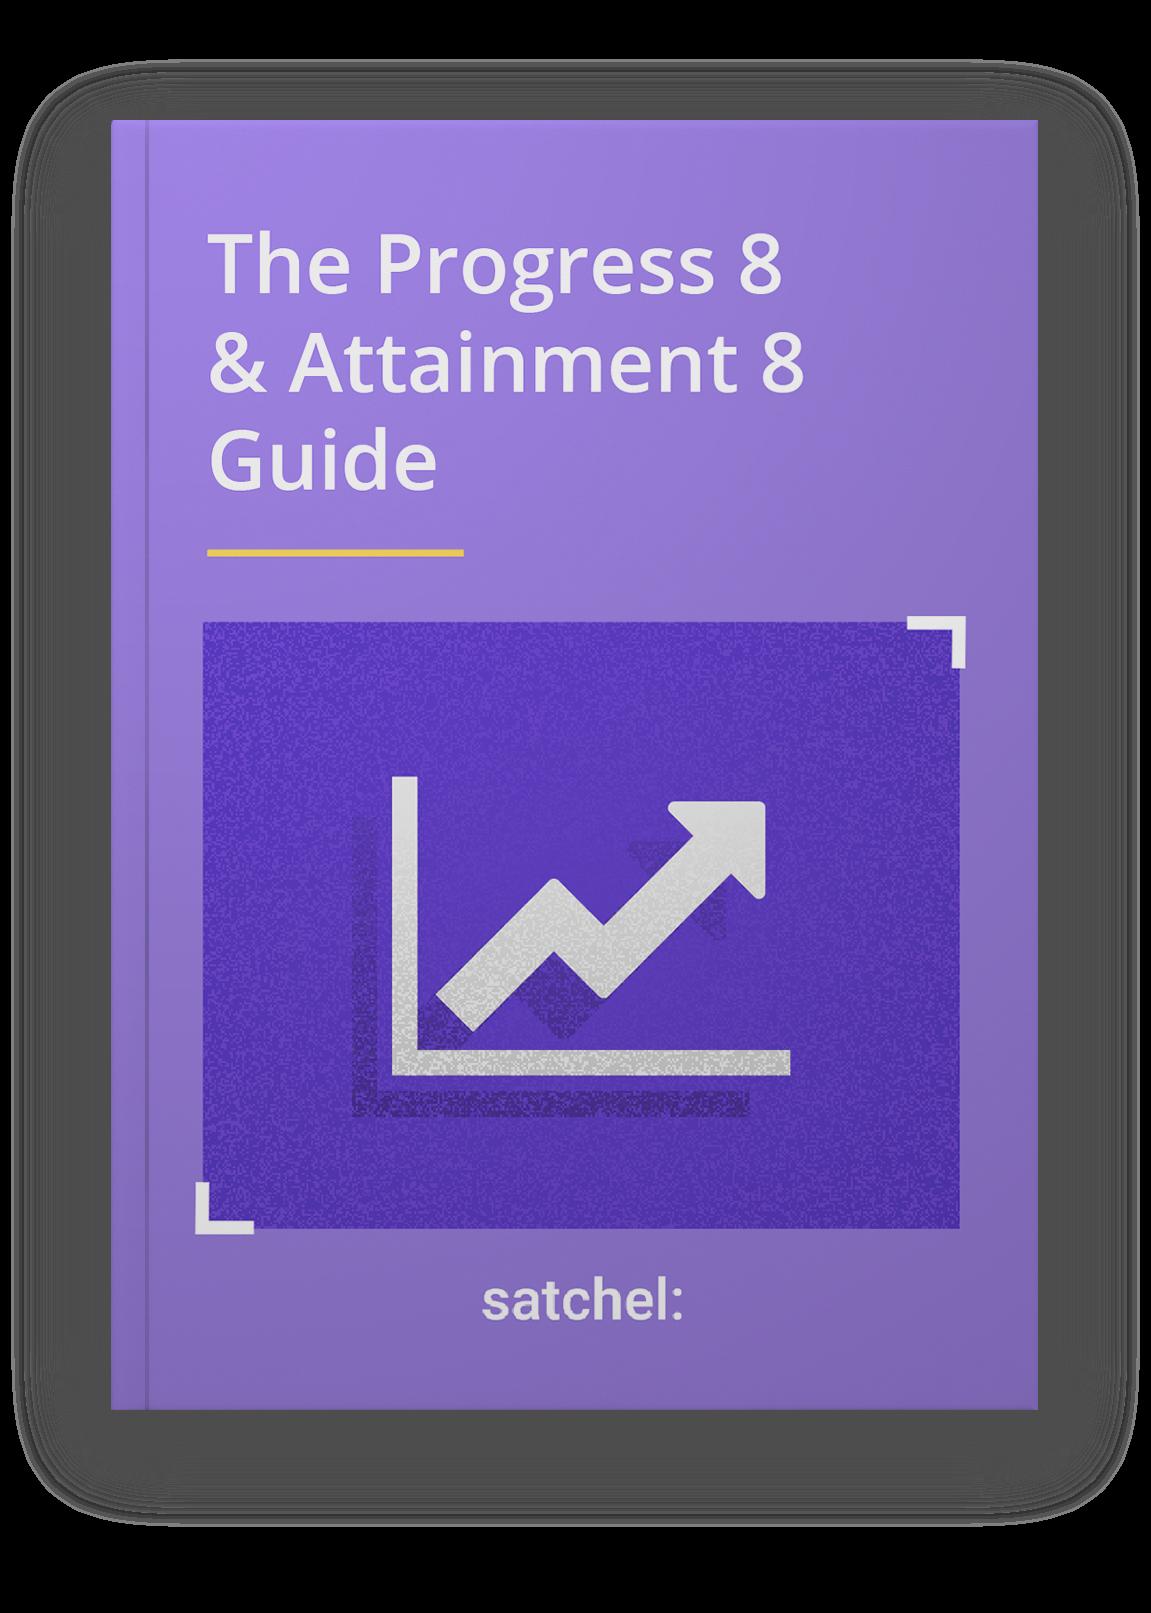 Progress 8 Guide